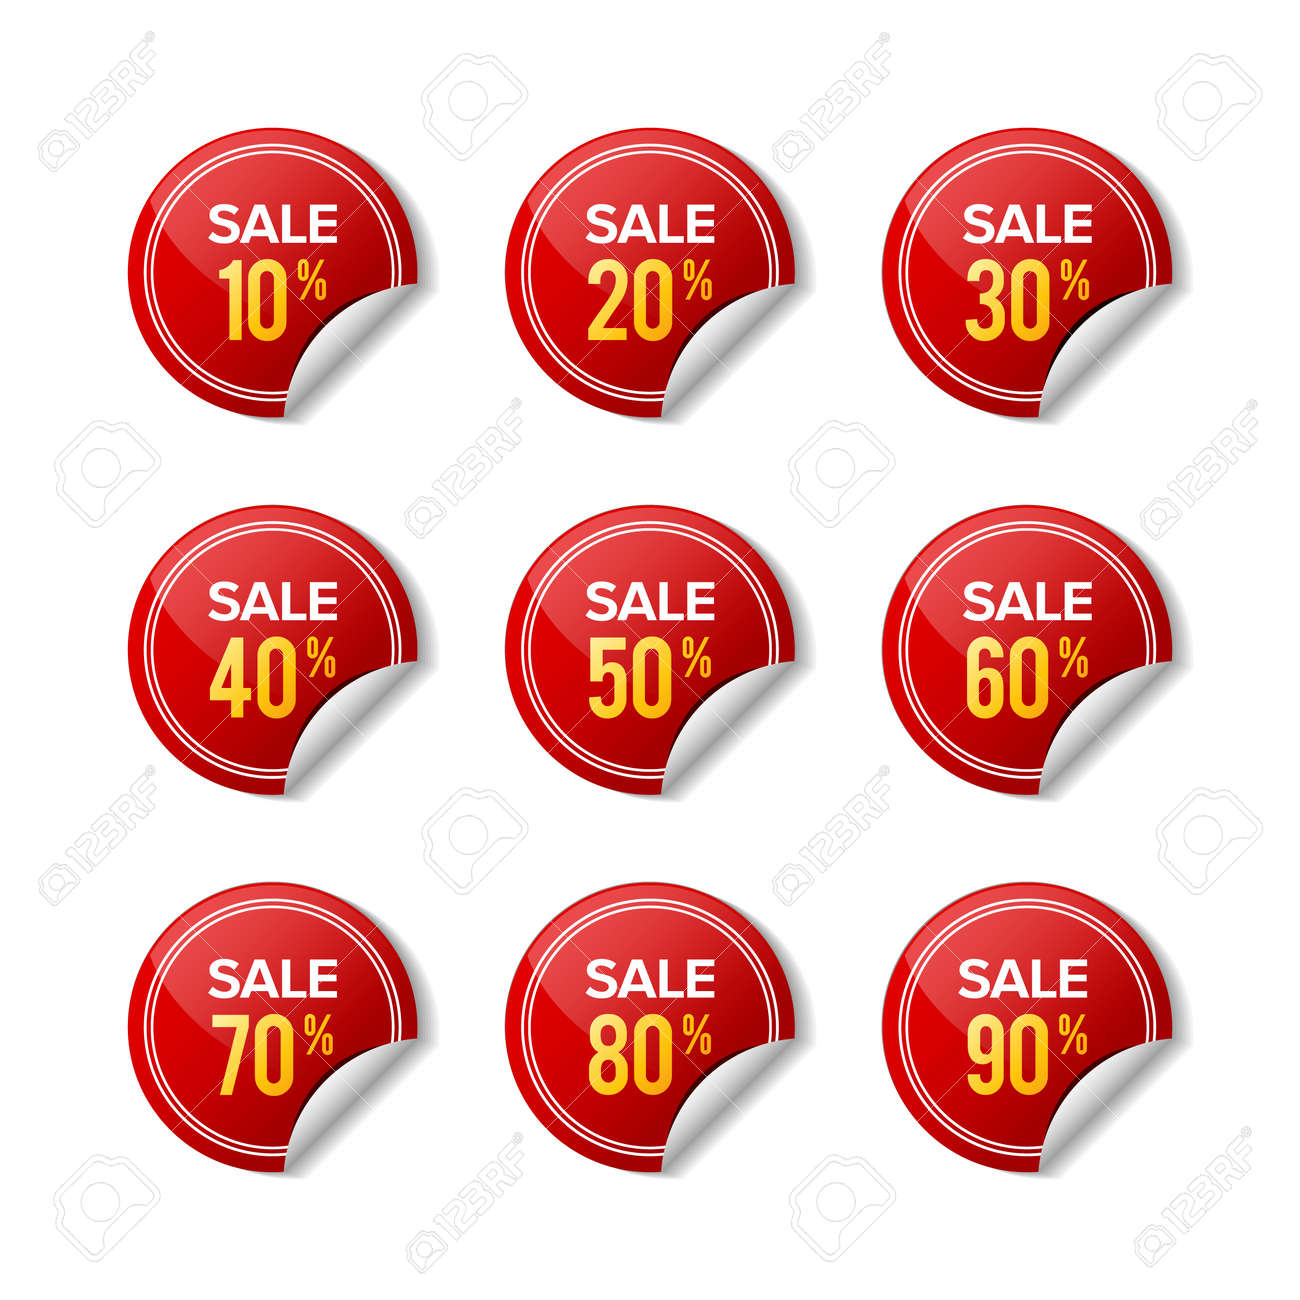 Sale sticker discount red label. Designs for retail, special offer, mega sale, big sale, hot sale, promotion, etc. Graphic designs - 136681838